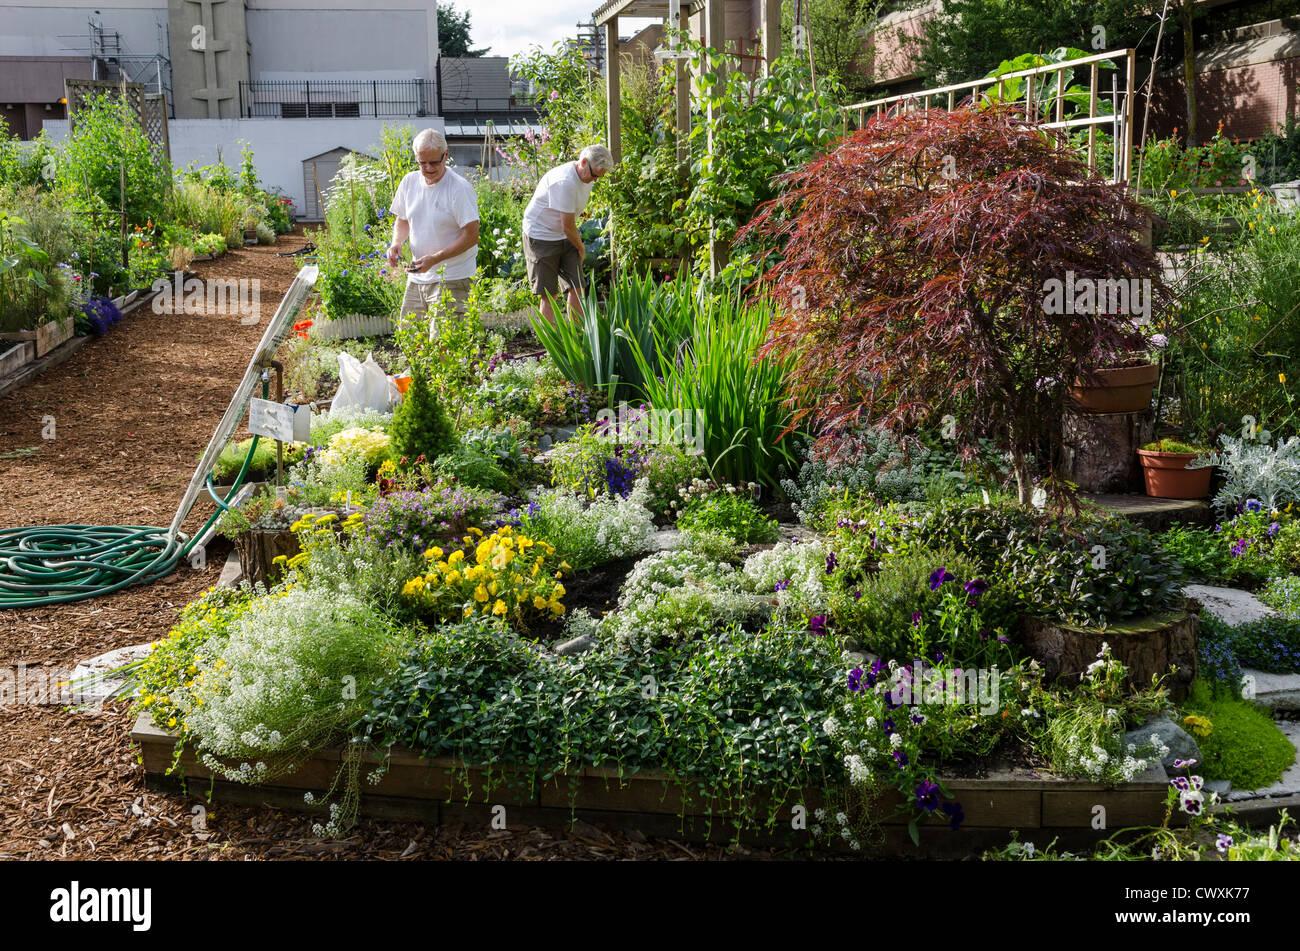 Urban garden gardening working in the community garden for Gardening tools vancouver